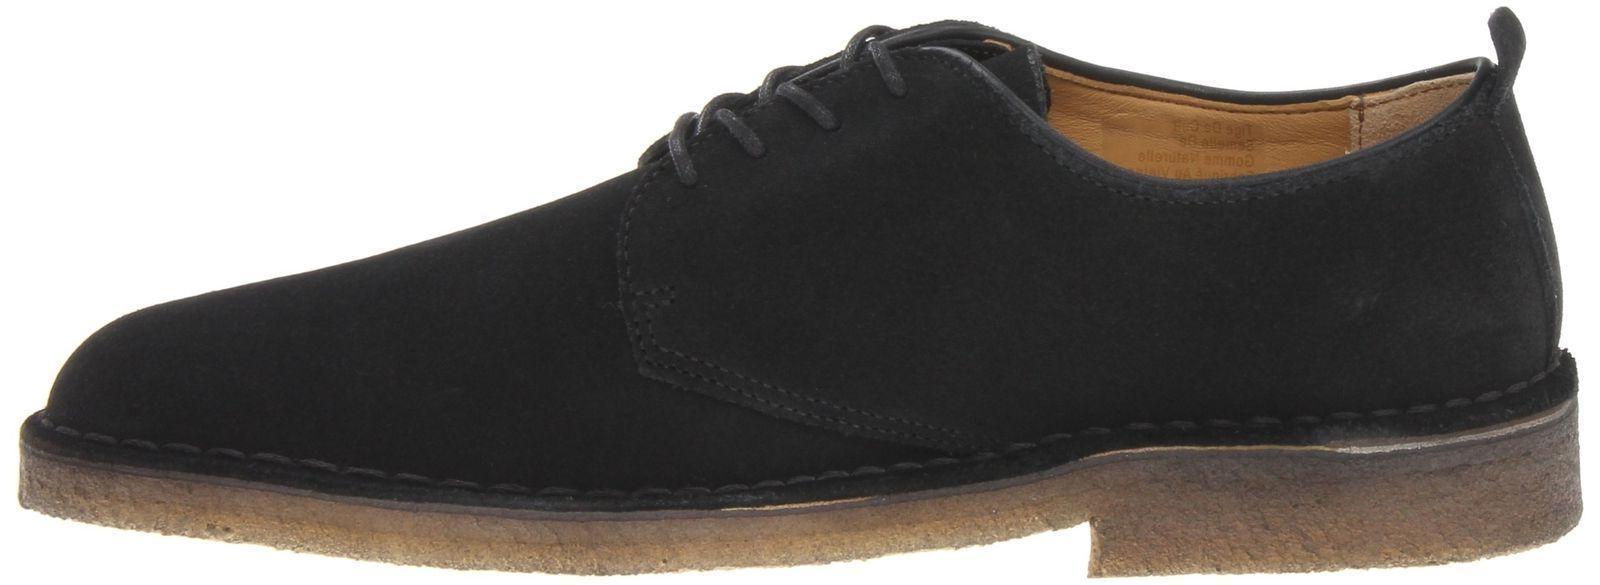 Clarks Originals Shoes